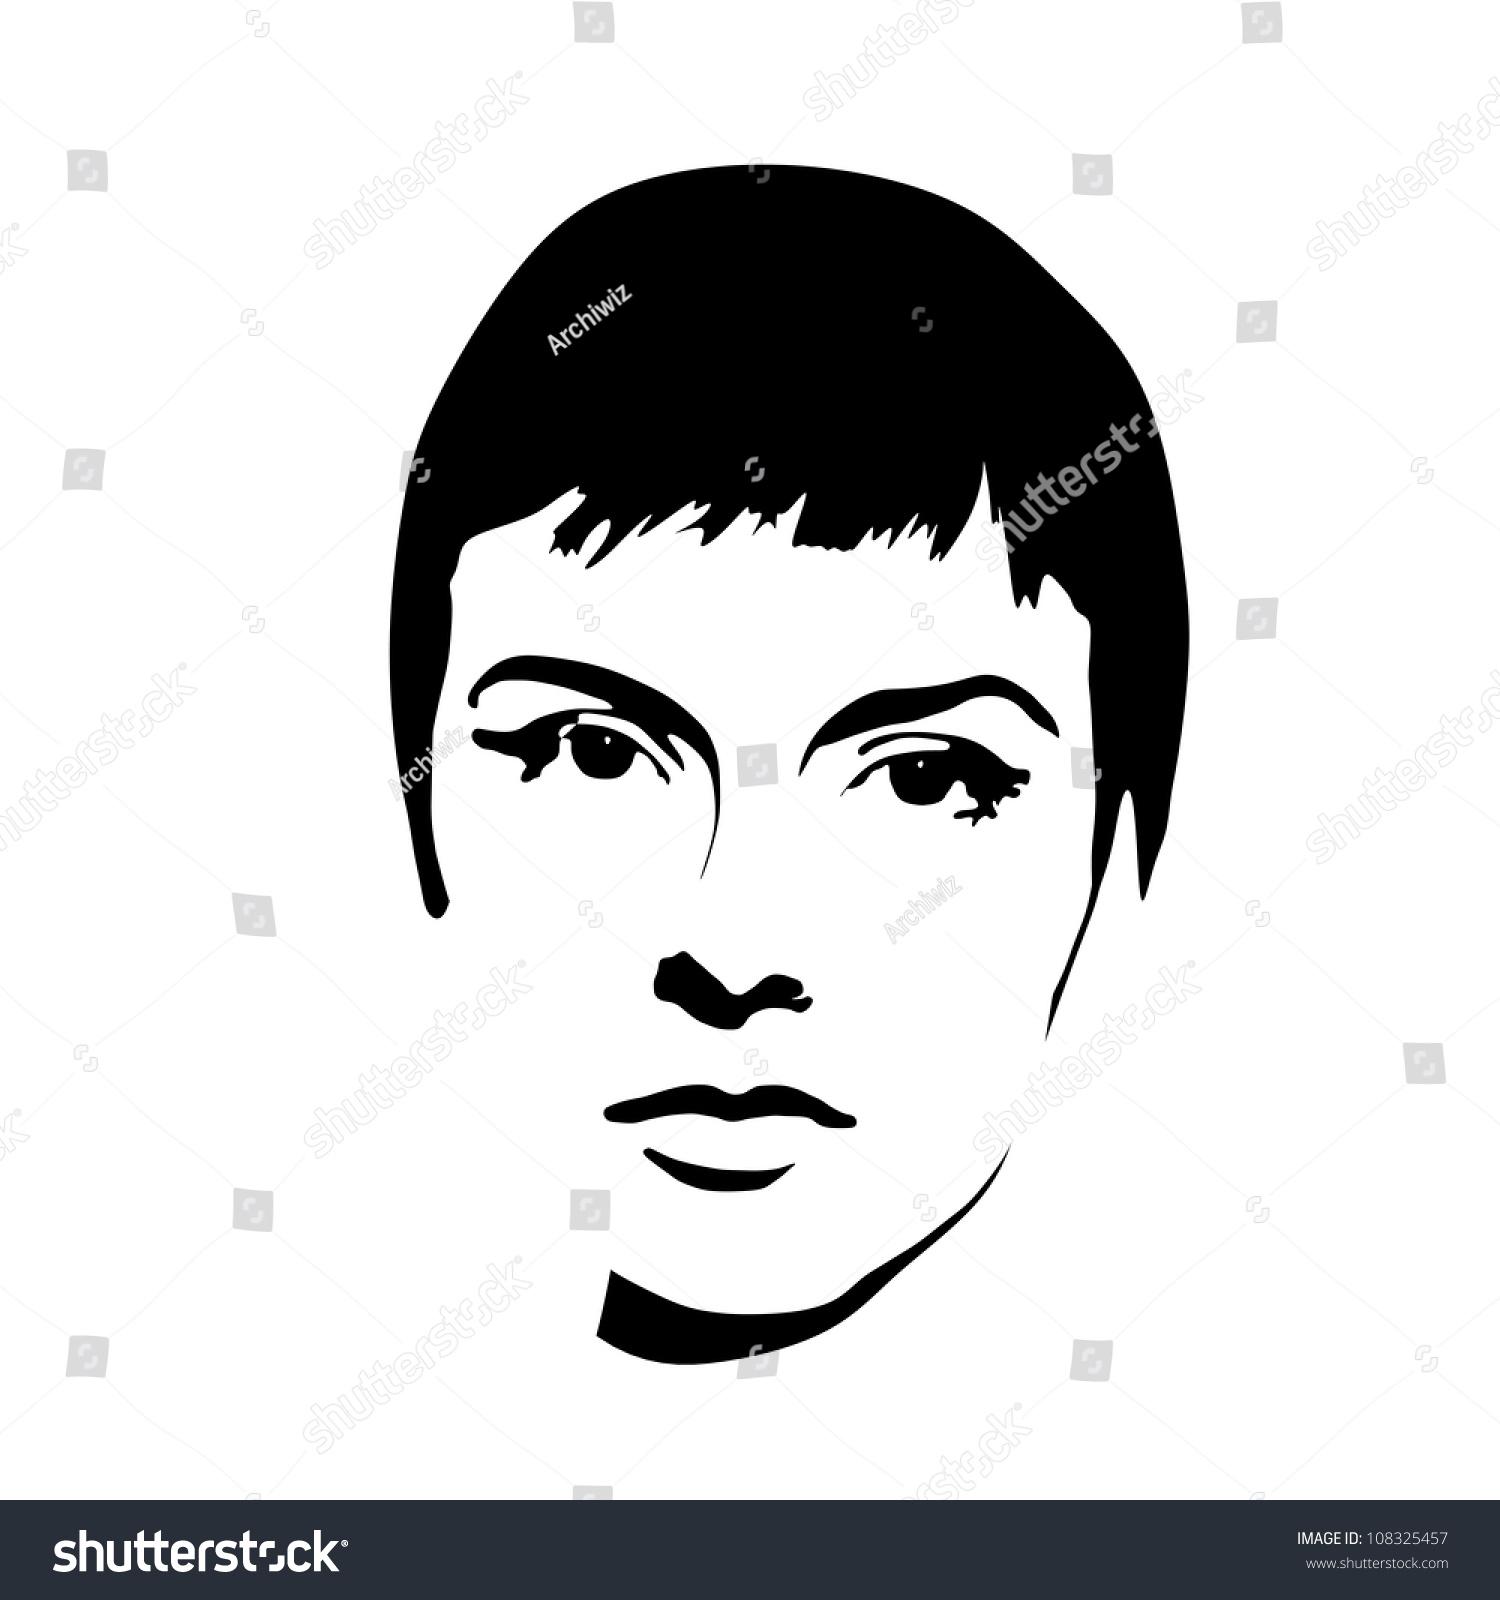 Vintage Silhouette Face